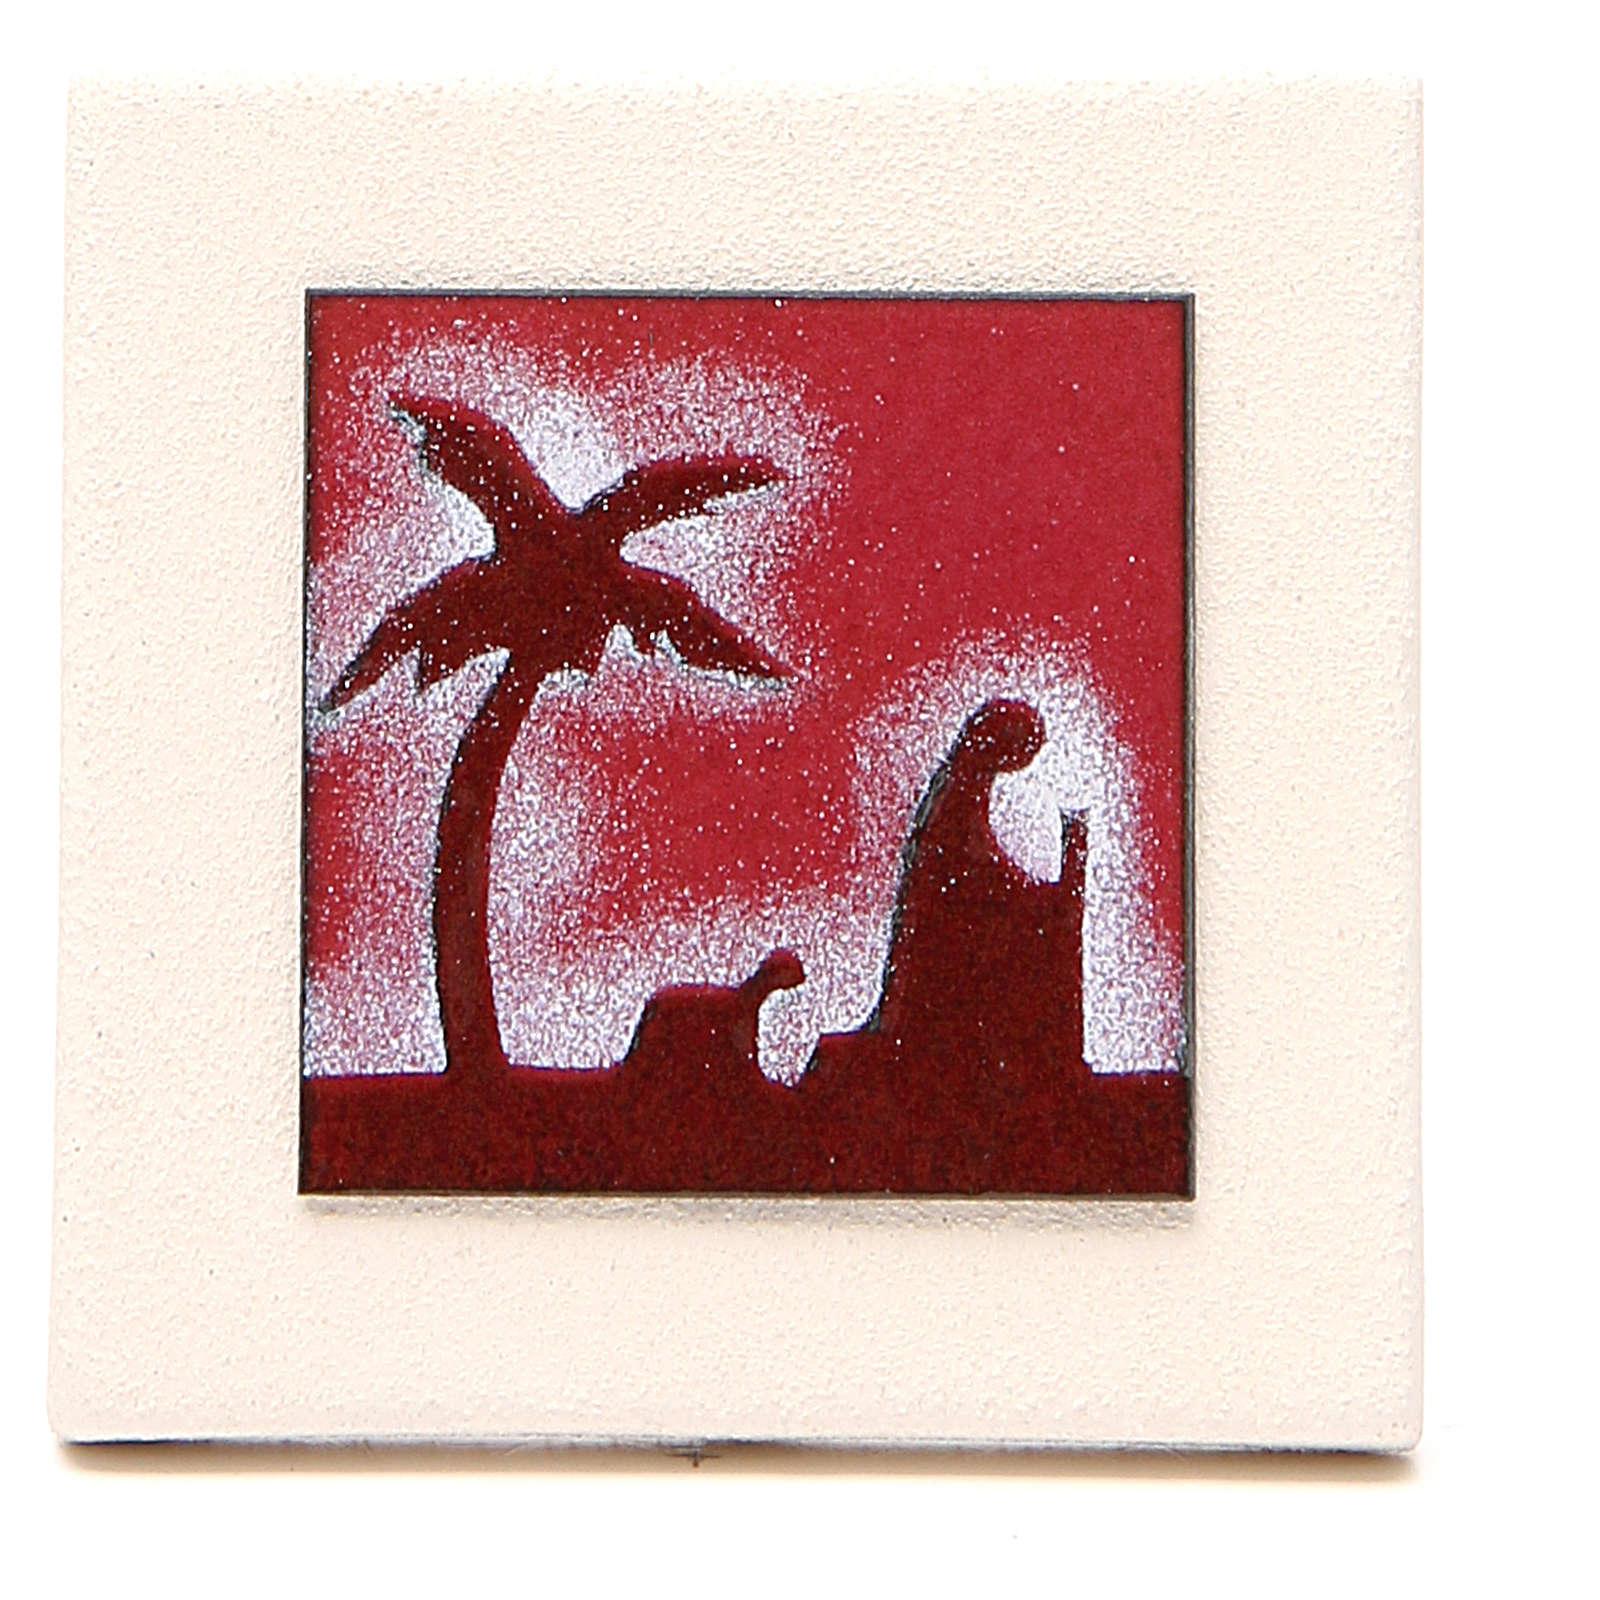 Triptych of red scenes, Ceramics Centro Ave 9.8cm 4